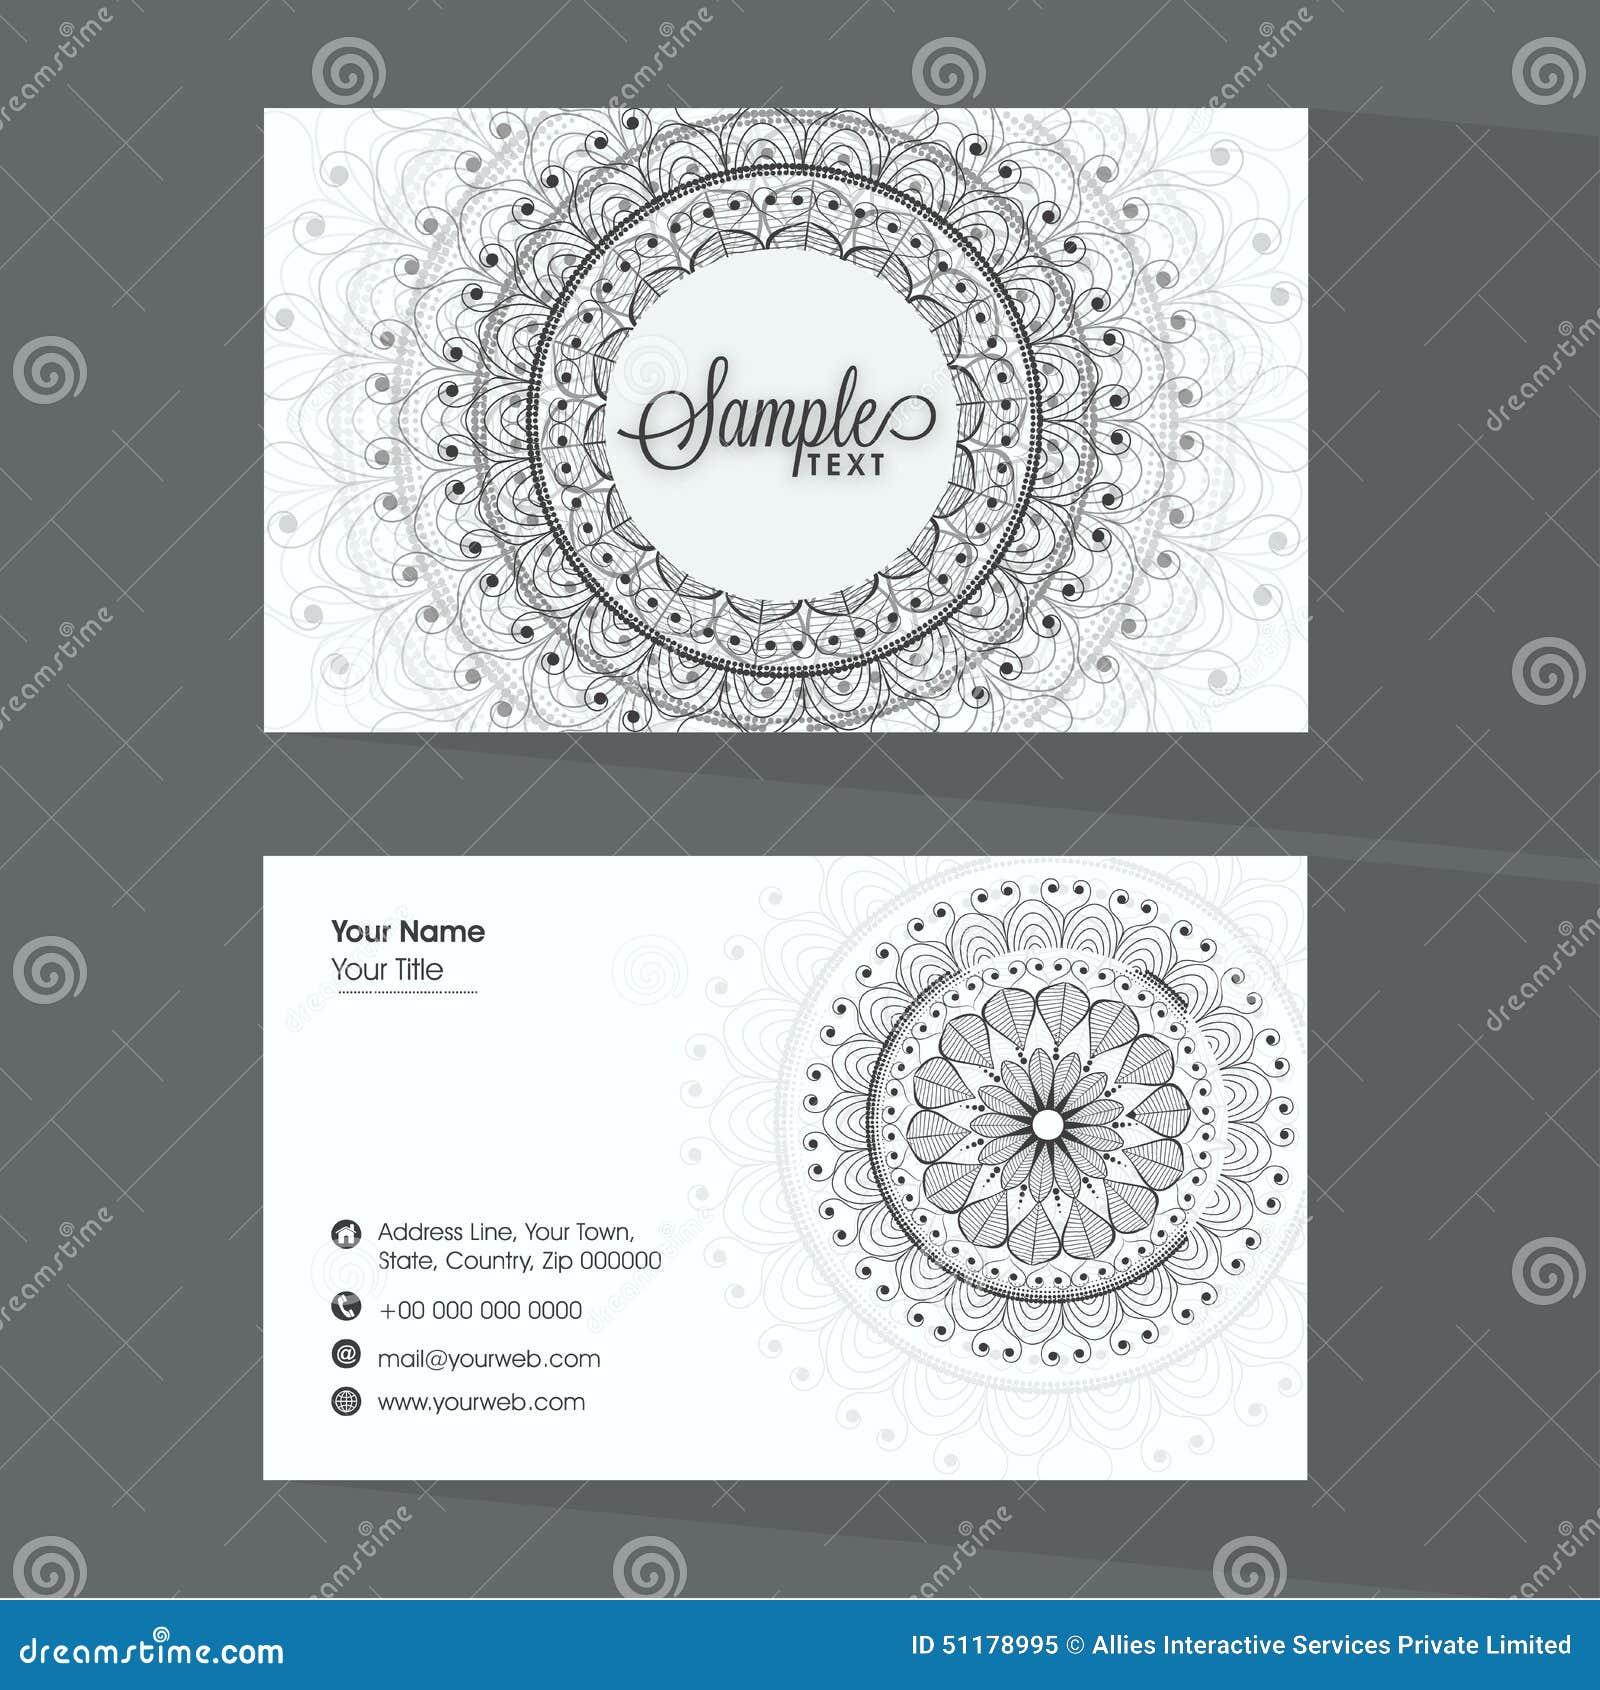 beautiful business card design stock illustration  image: 51178995